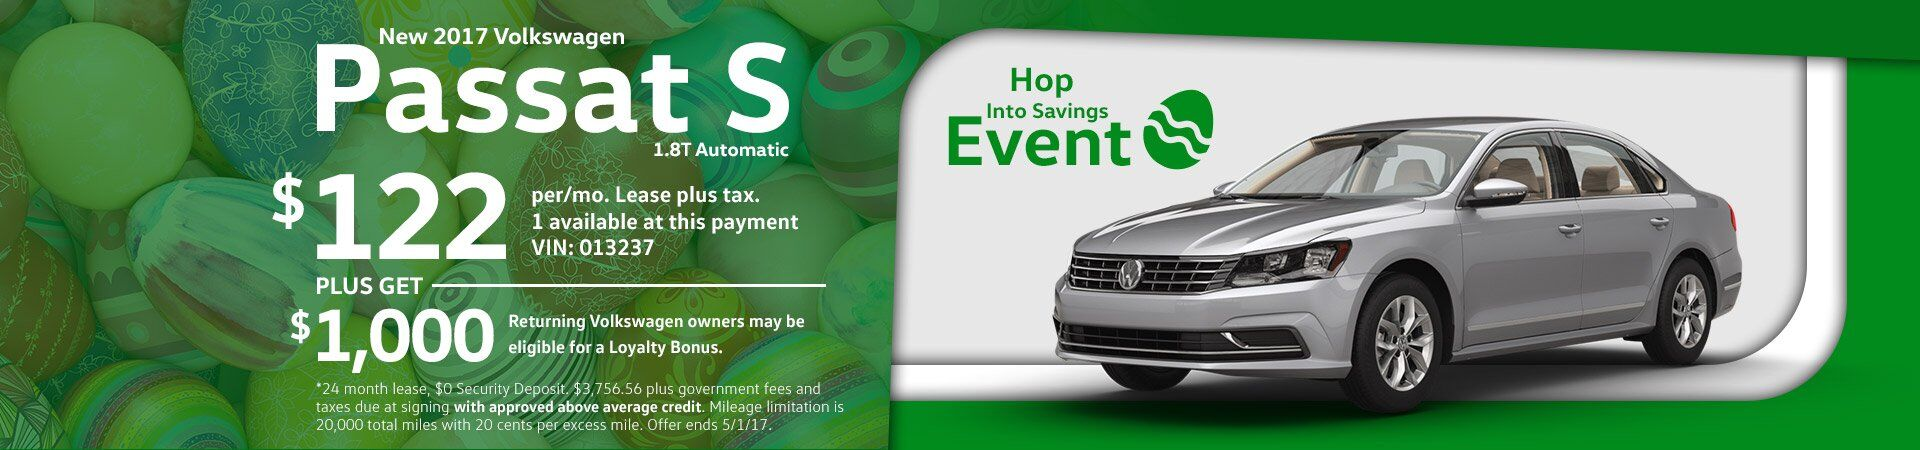 Volkswagen Dealership Serving San Diego | Serving the Volkswagen sales and service needs of San ...